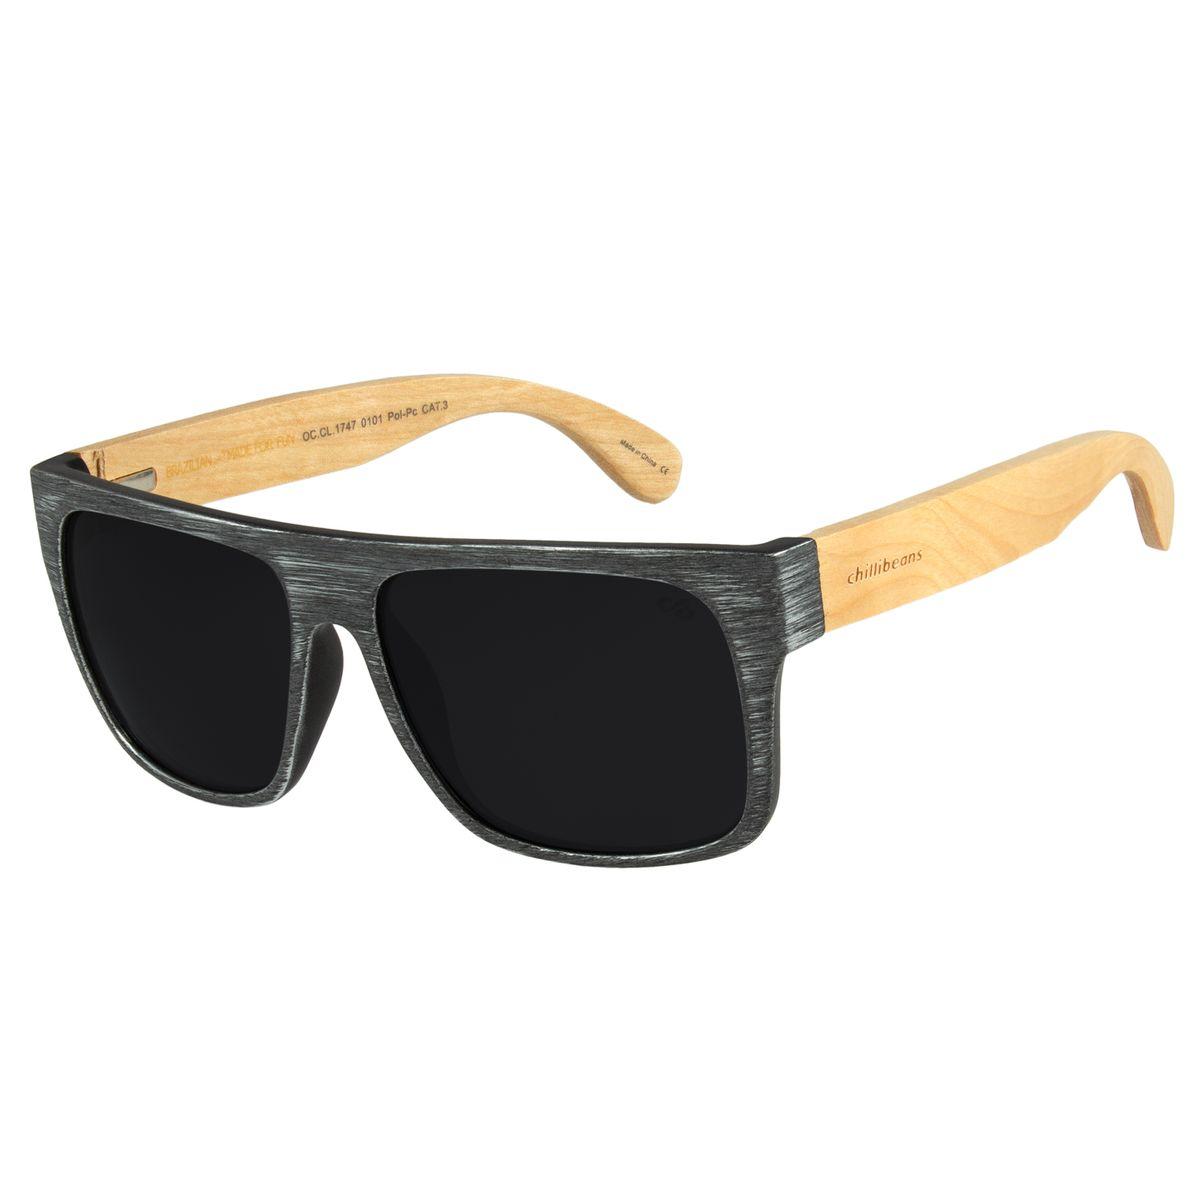 4a4fa85f2efda Óculos de Sol Masculino Chilli Beans Haste de Bambu Preto Polarizado ...